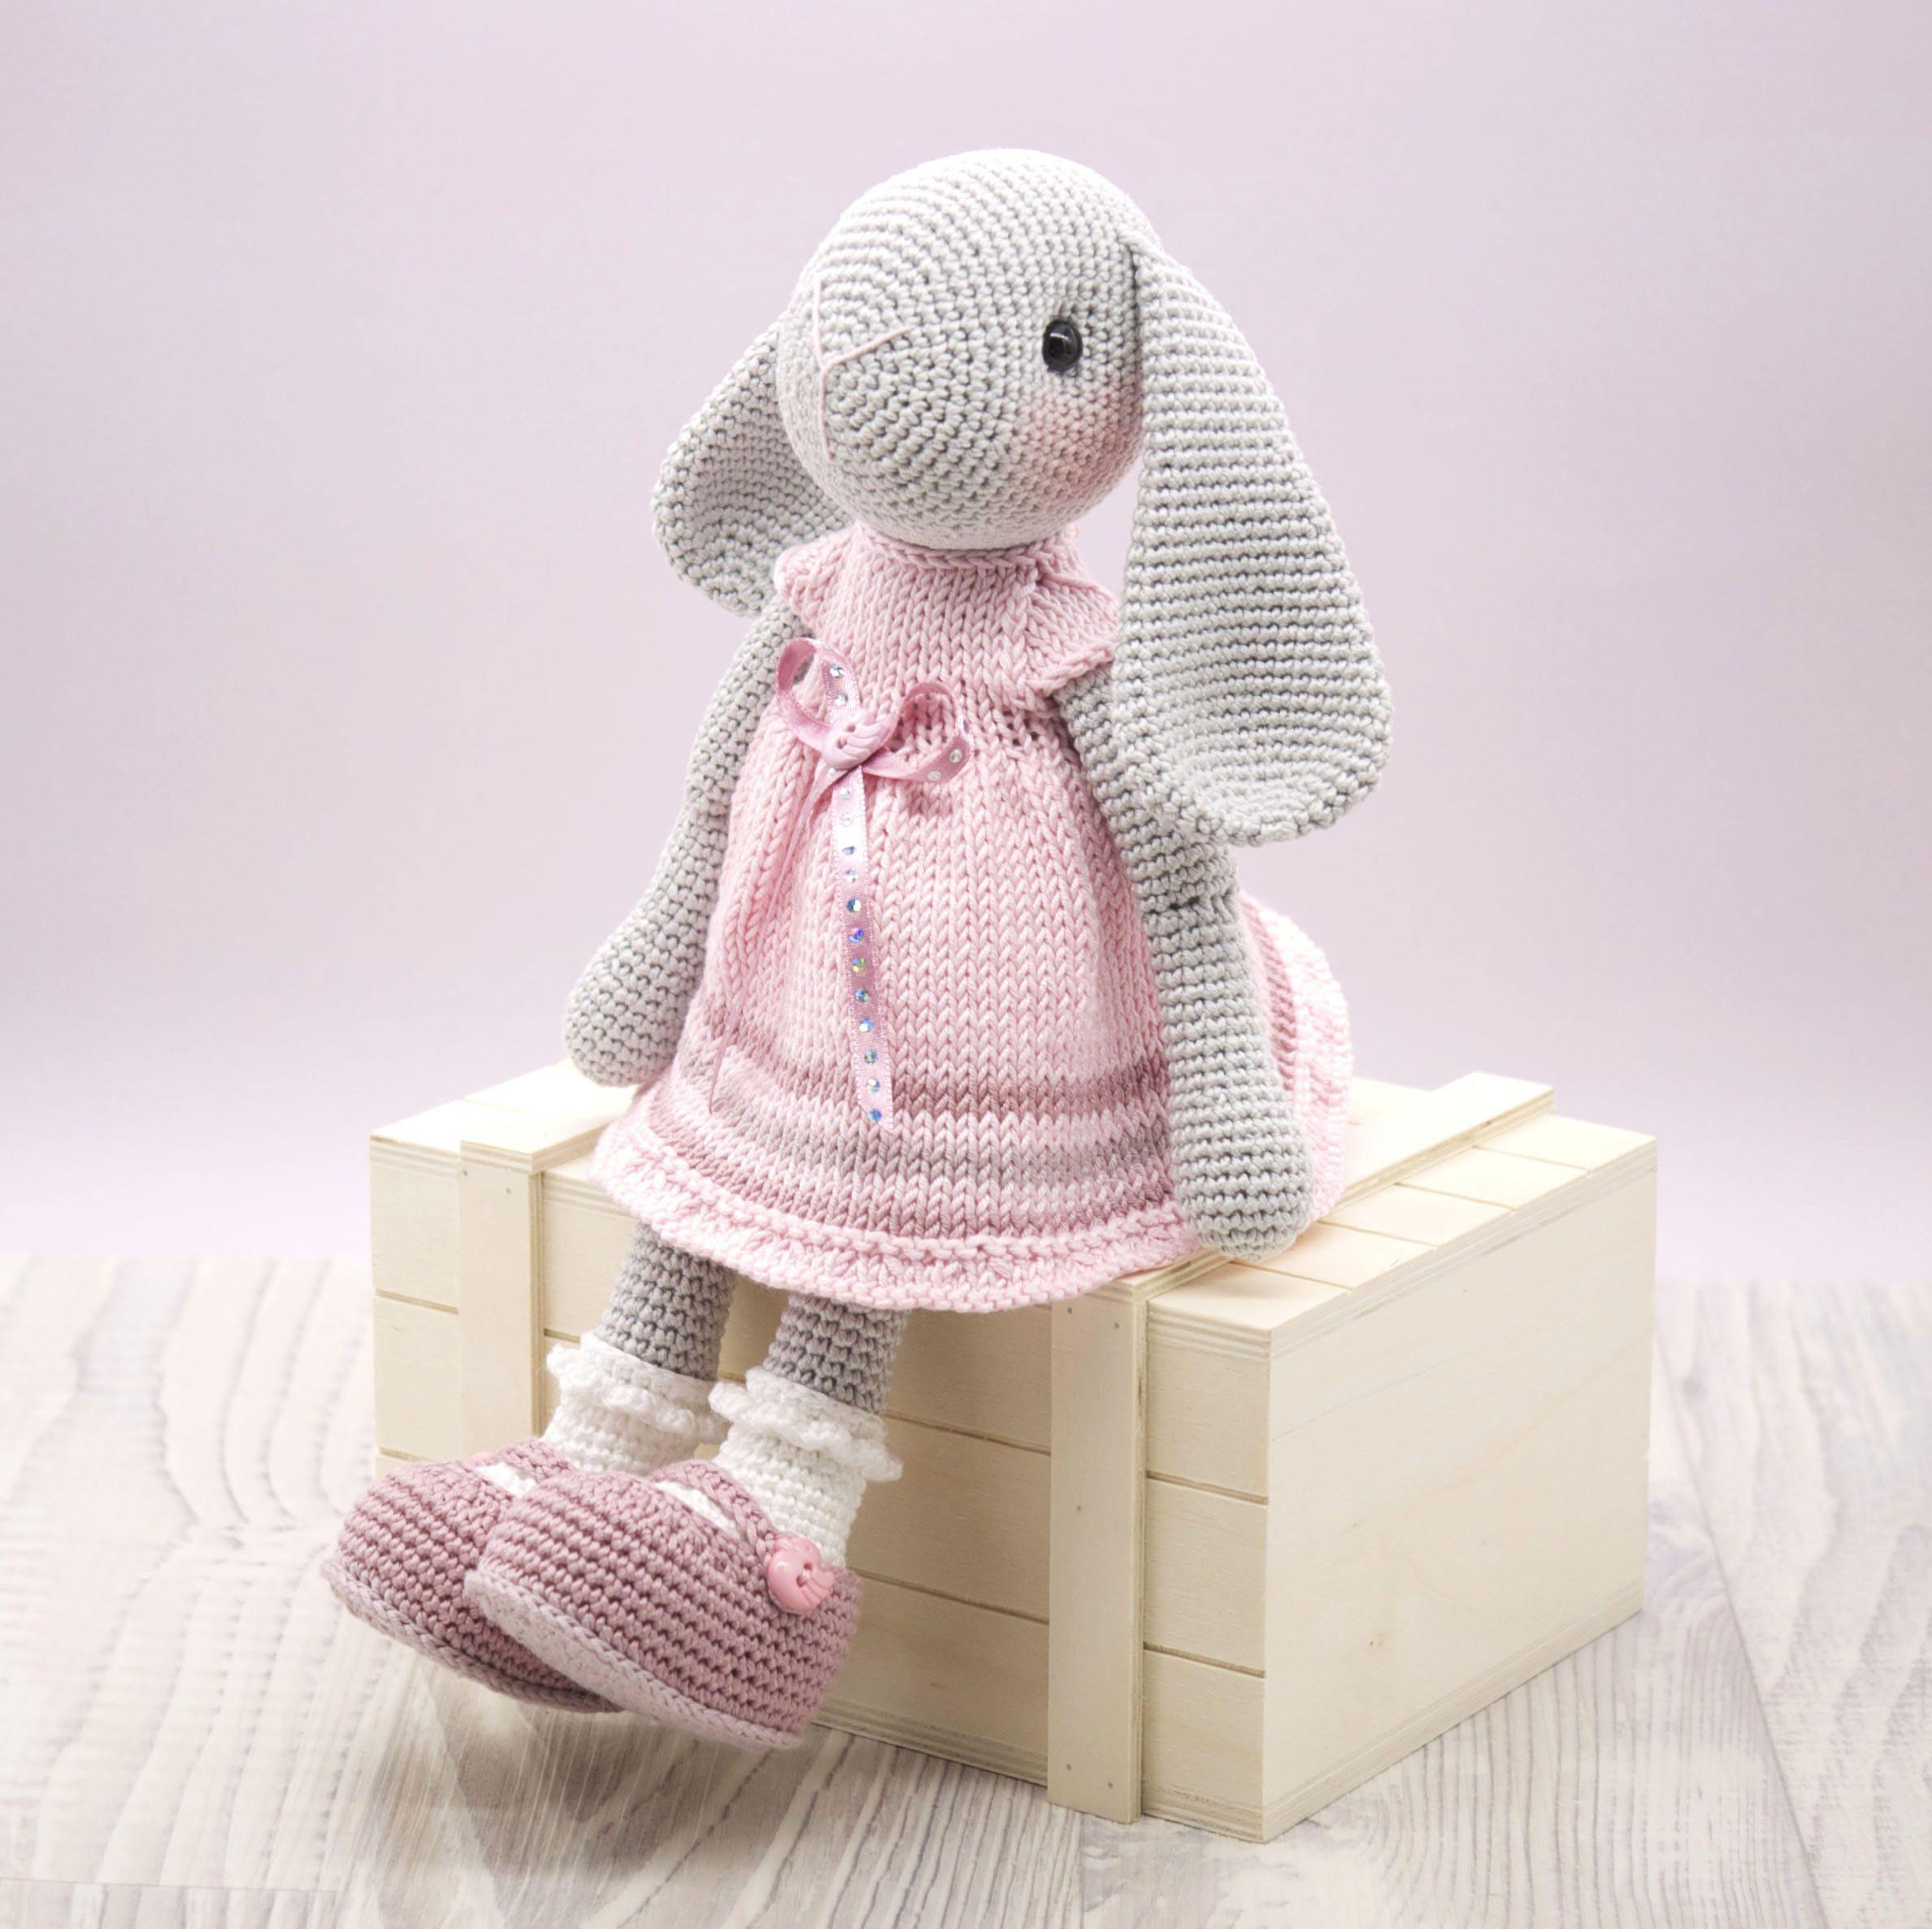 BubblesAndBongo | Вязанные игрушки | Pinterest | Häkeln, Hase und ...